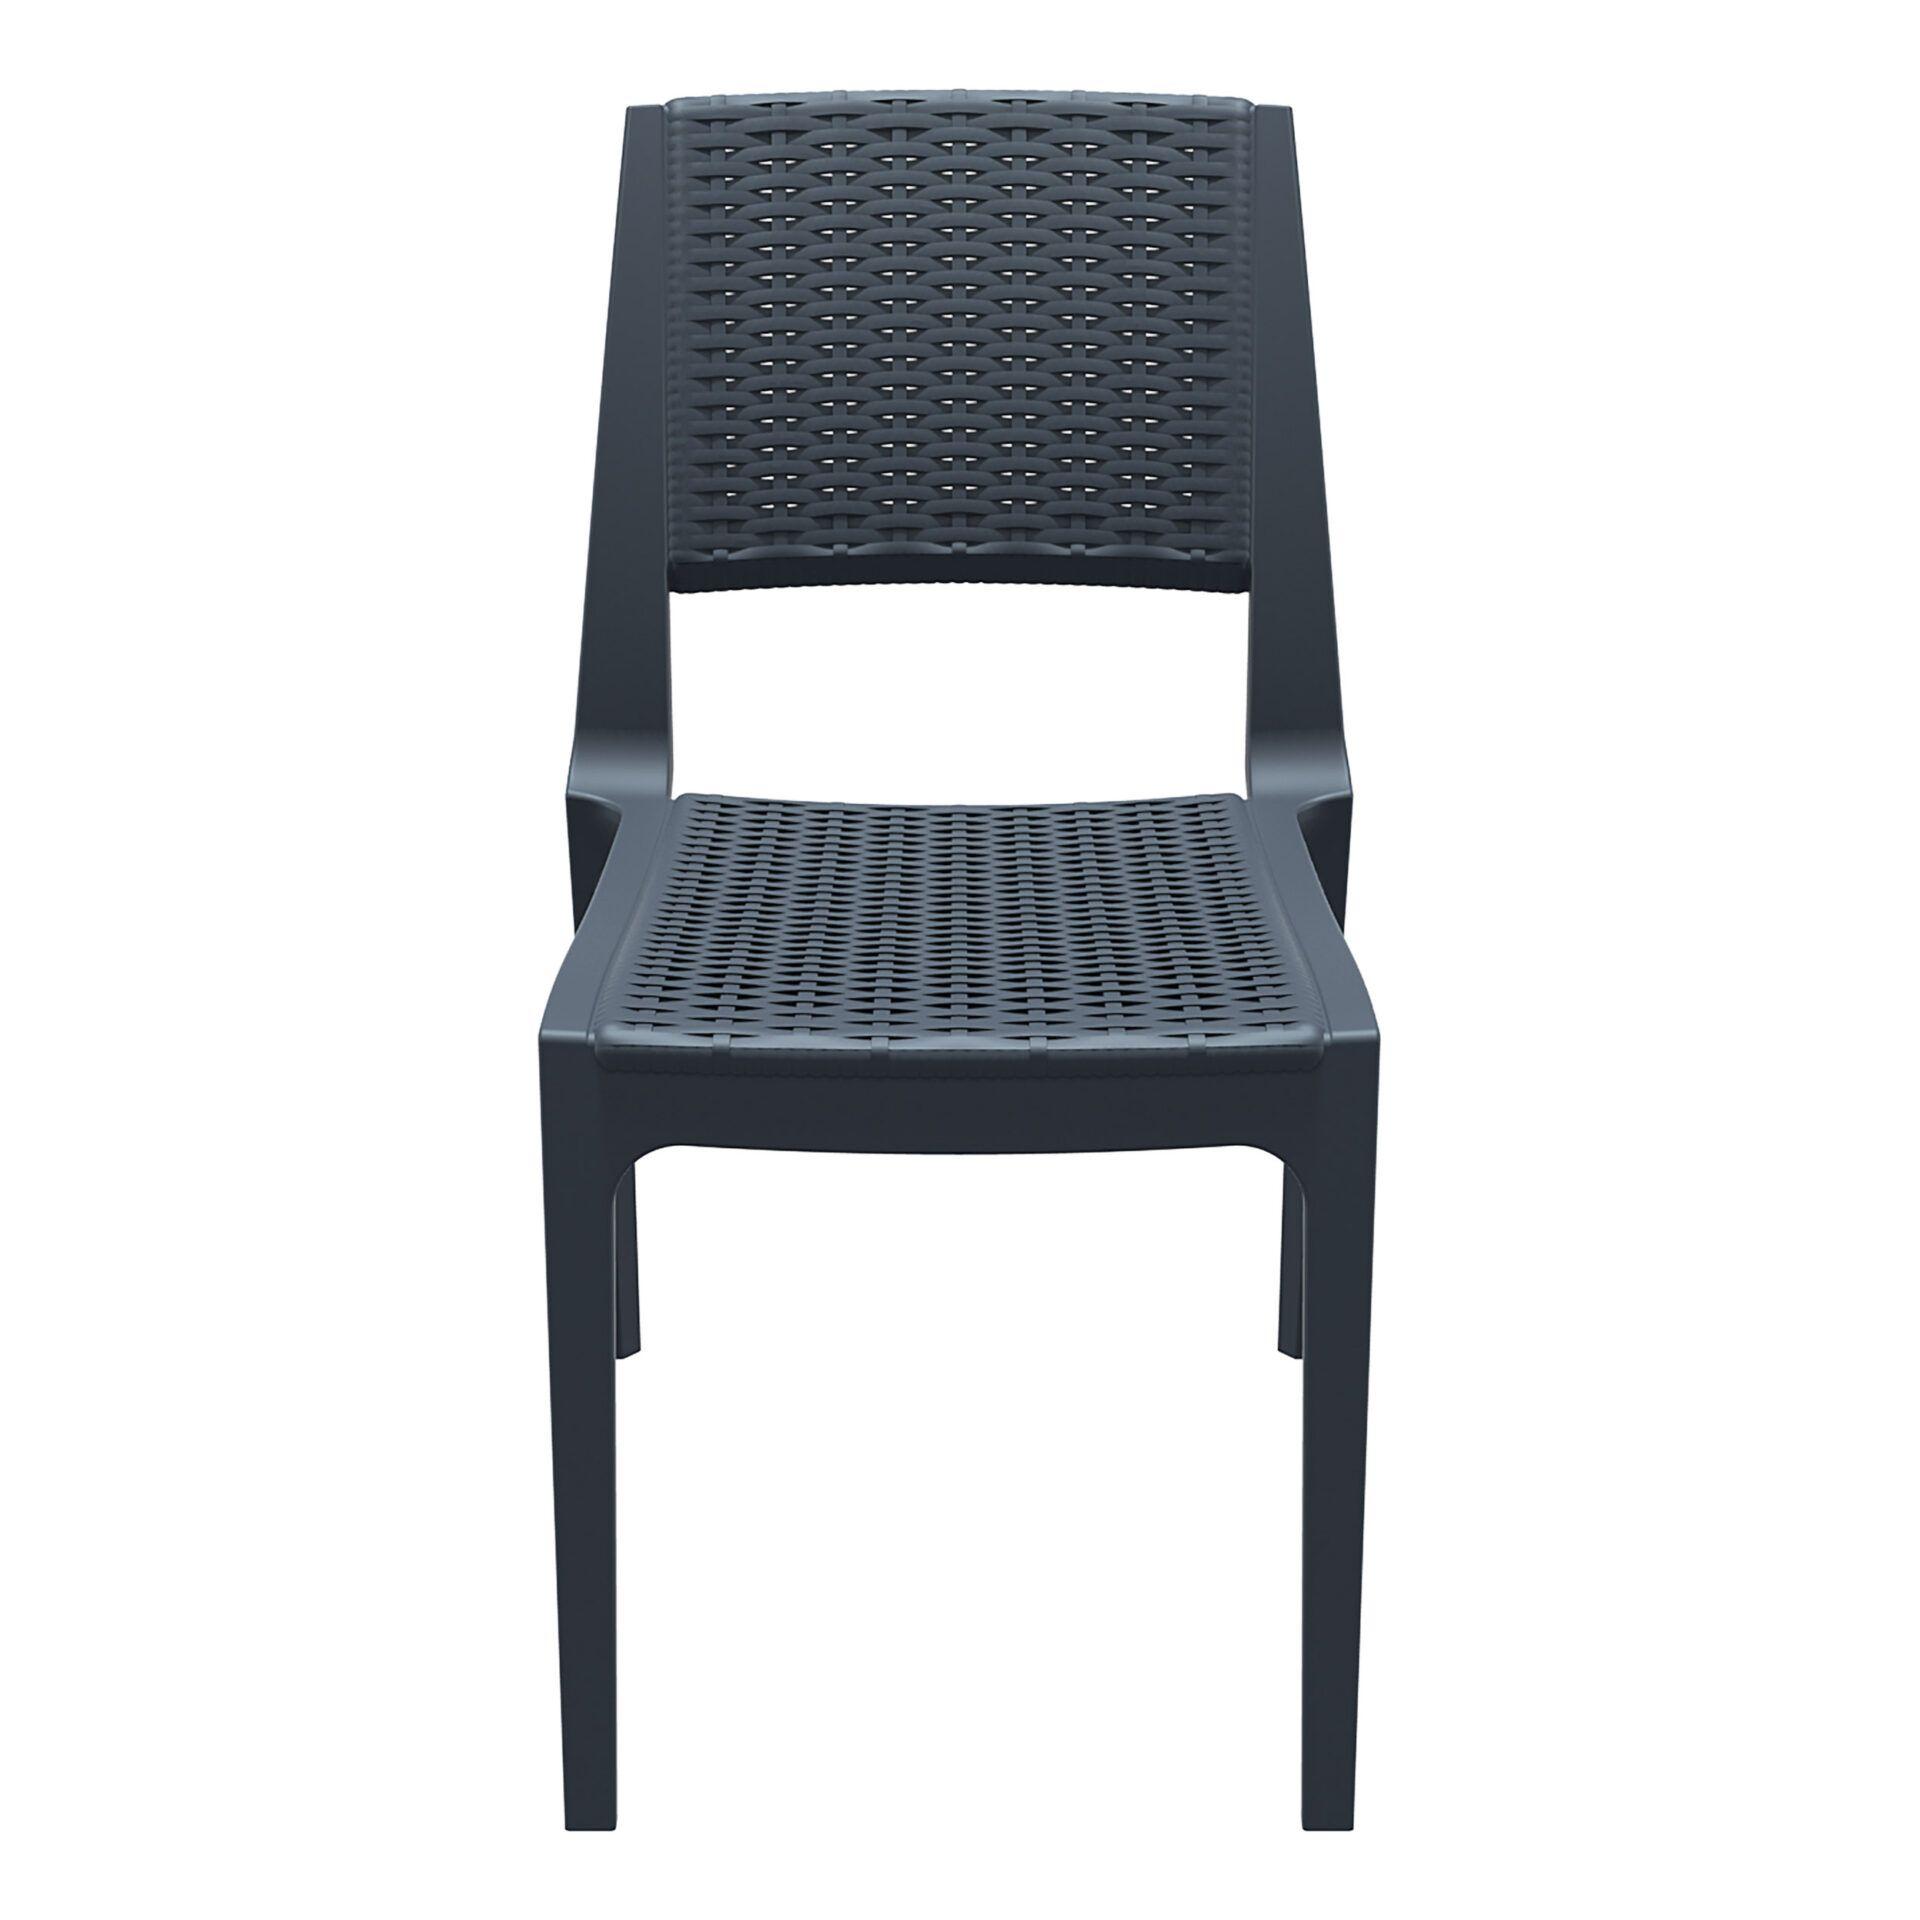 resin rattan outdoor cafe verona chair darkgrey front